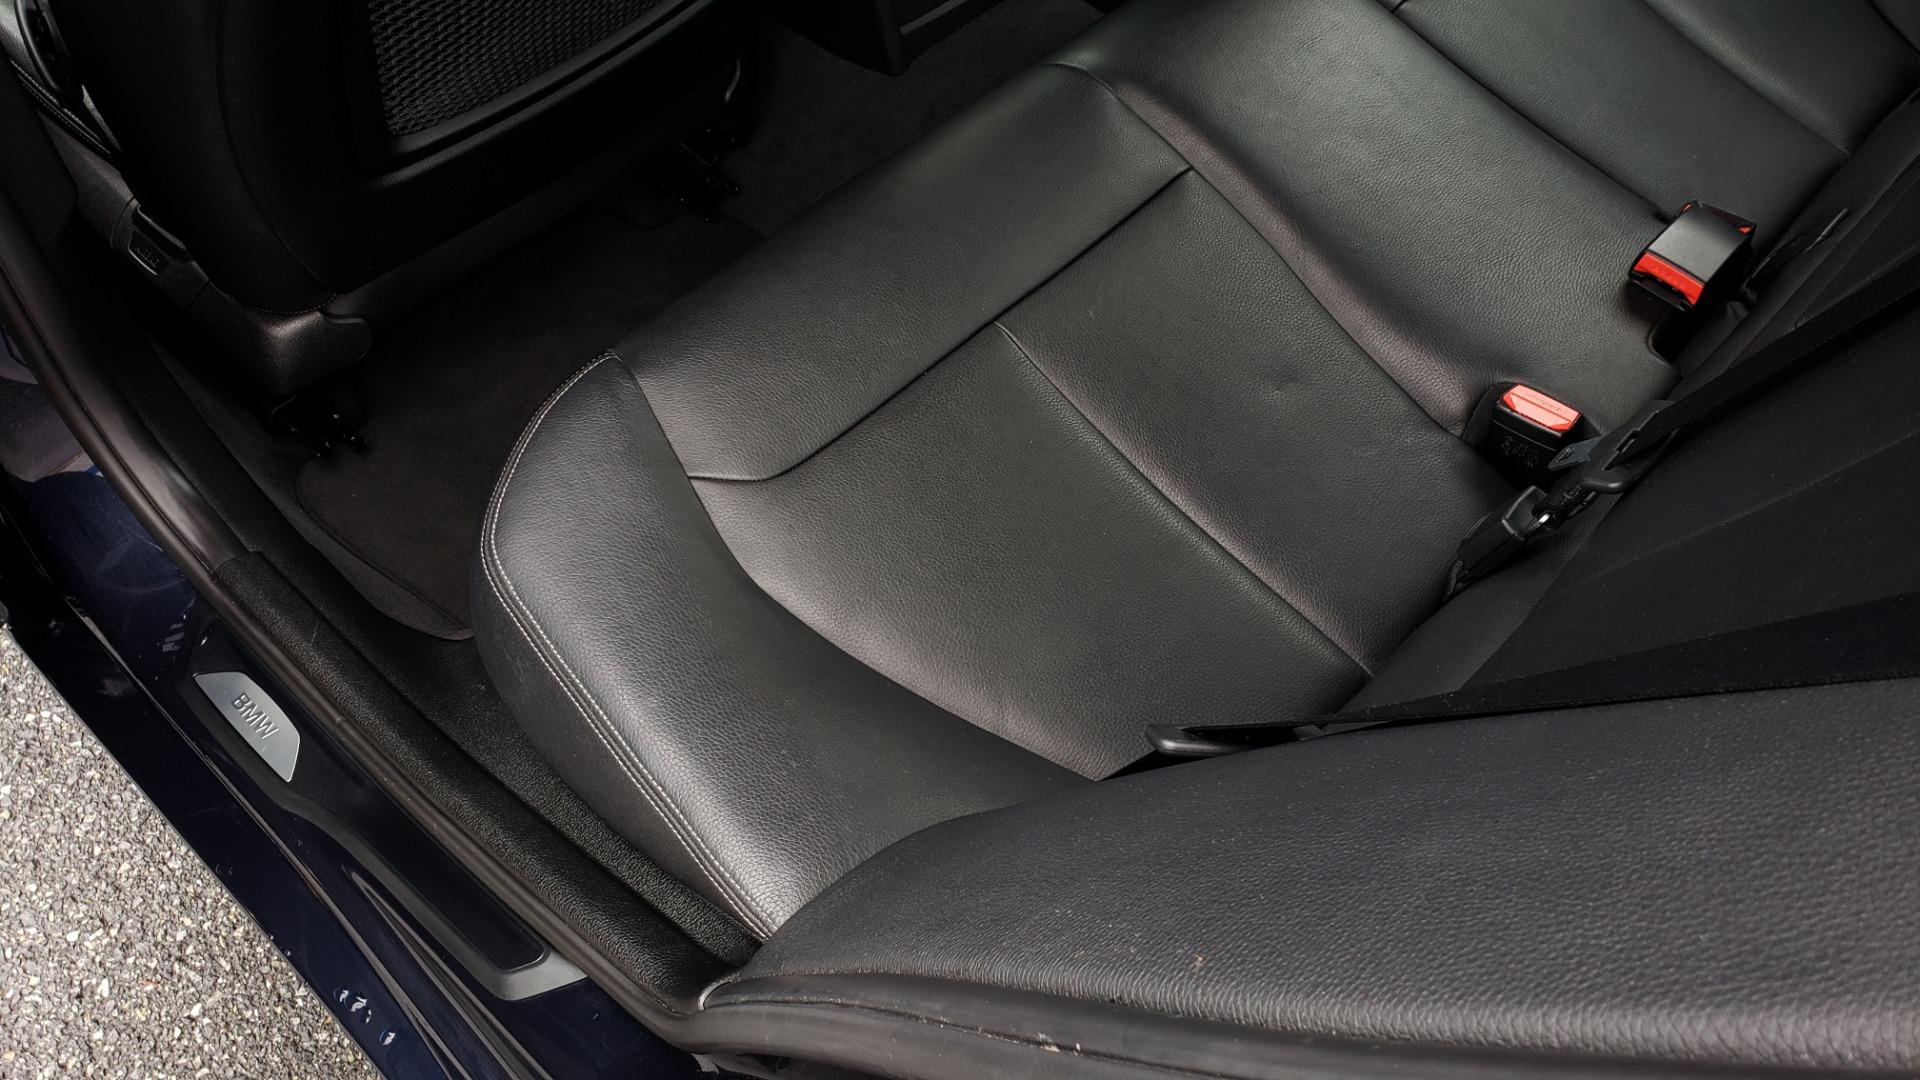 Used 2016 BMW 3 SERIES 328I PREMIUM PKG / DRVR ASST / SUNROOF / PARK ASST for sale Sold at Formula Imports in Charlotte NC 28227 56